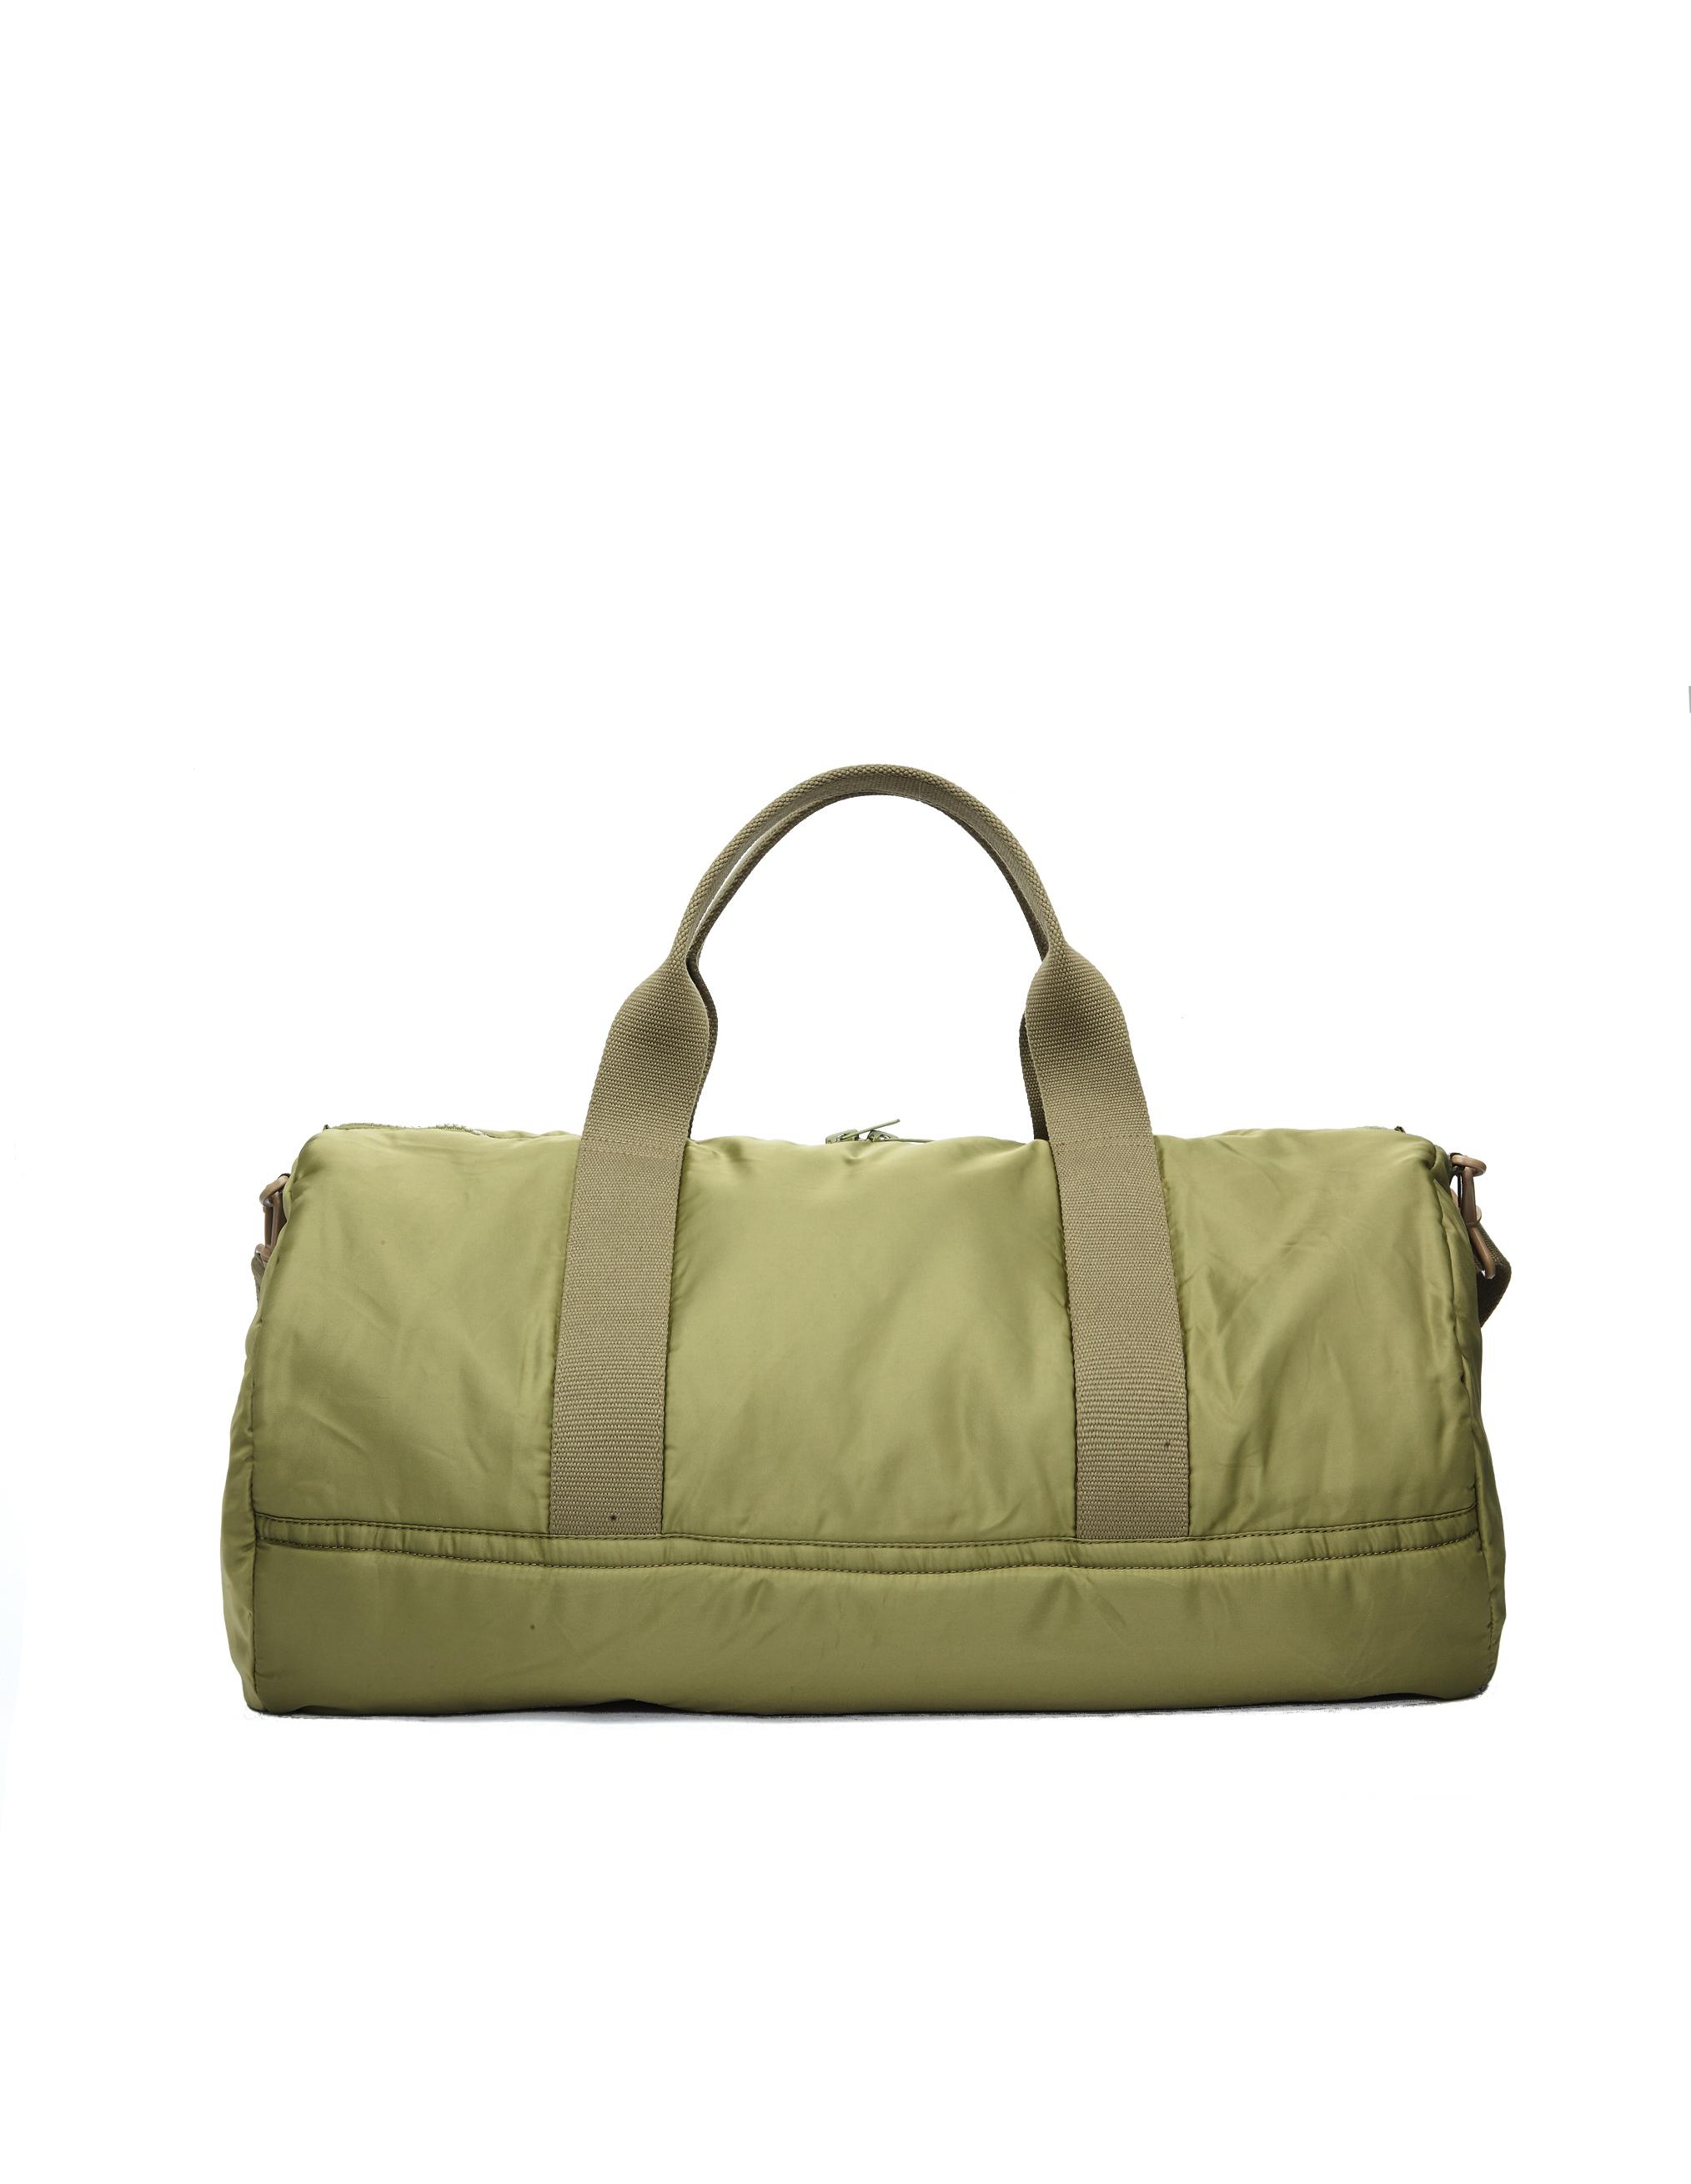 8d1491376d18 Yeezy Season 5 Gym Bag in Green for Men - Lyst